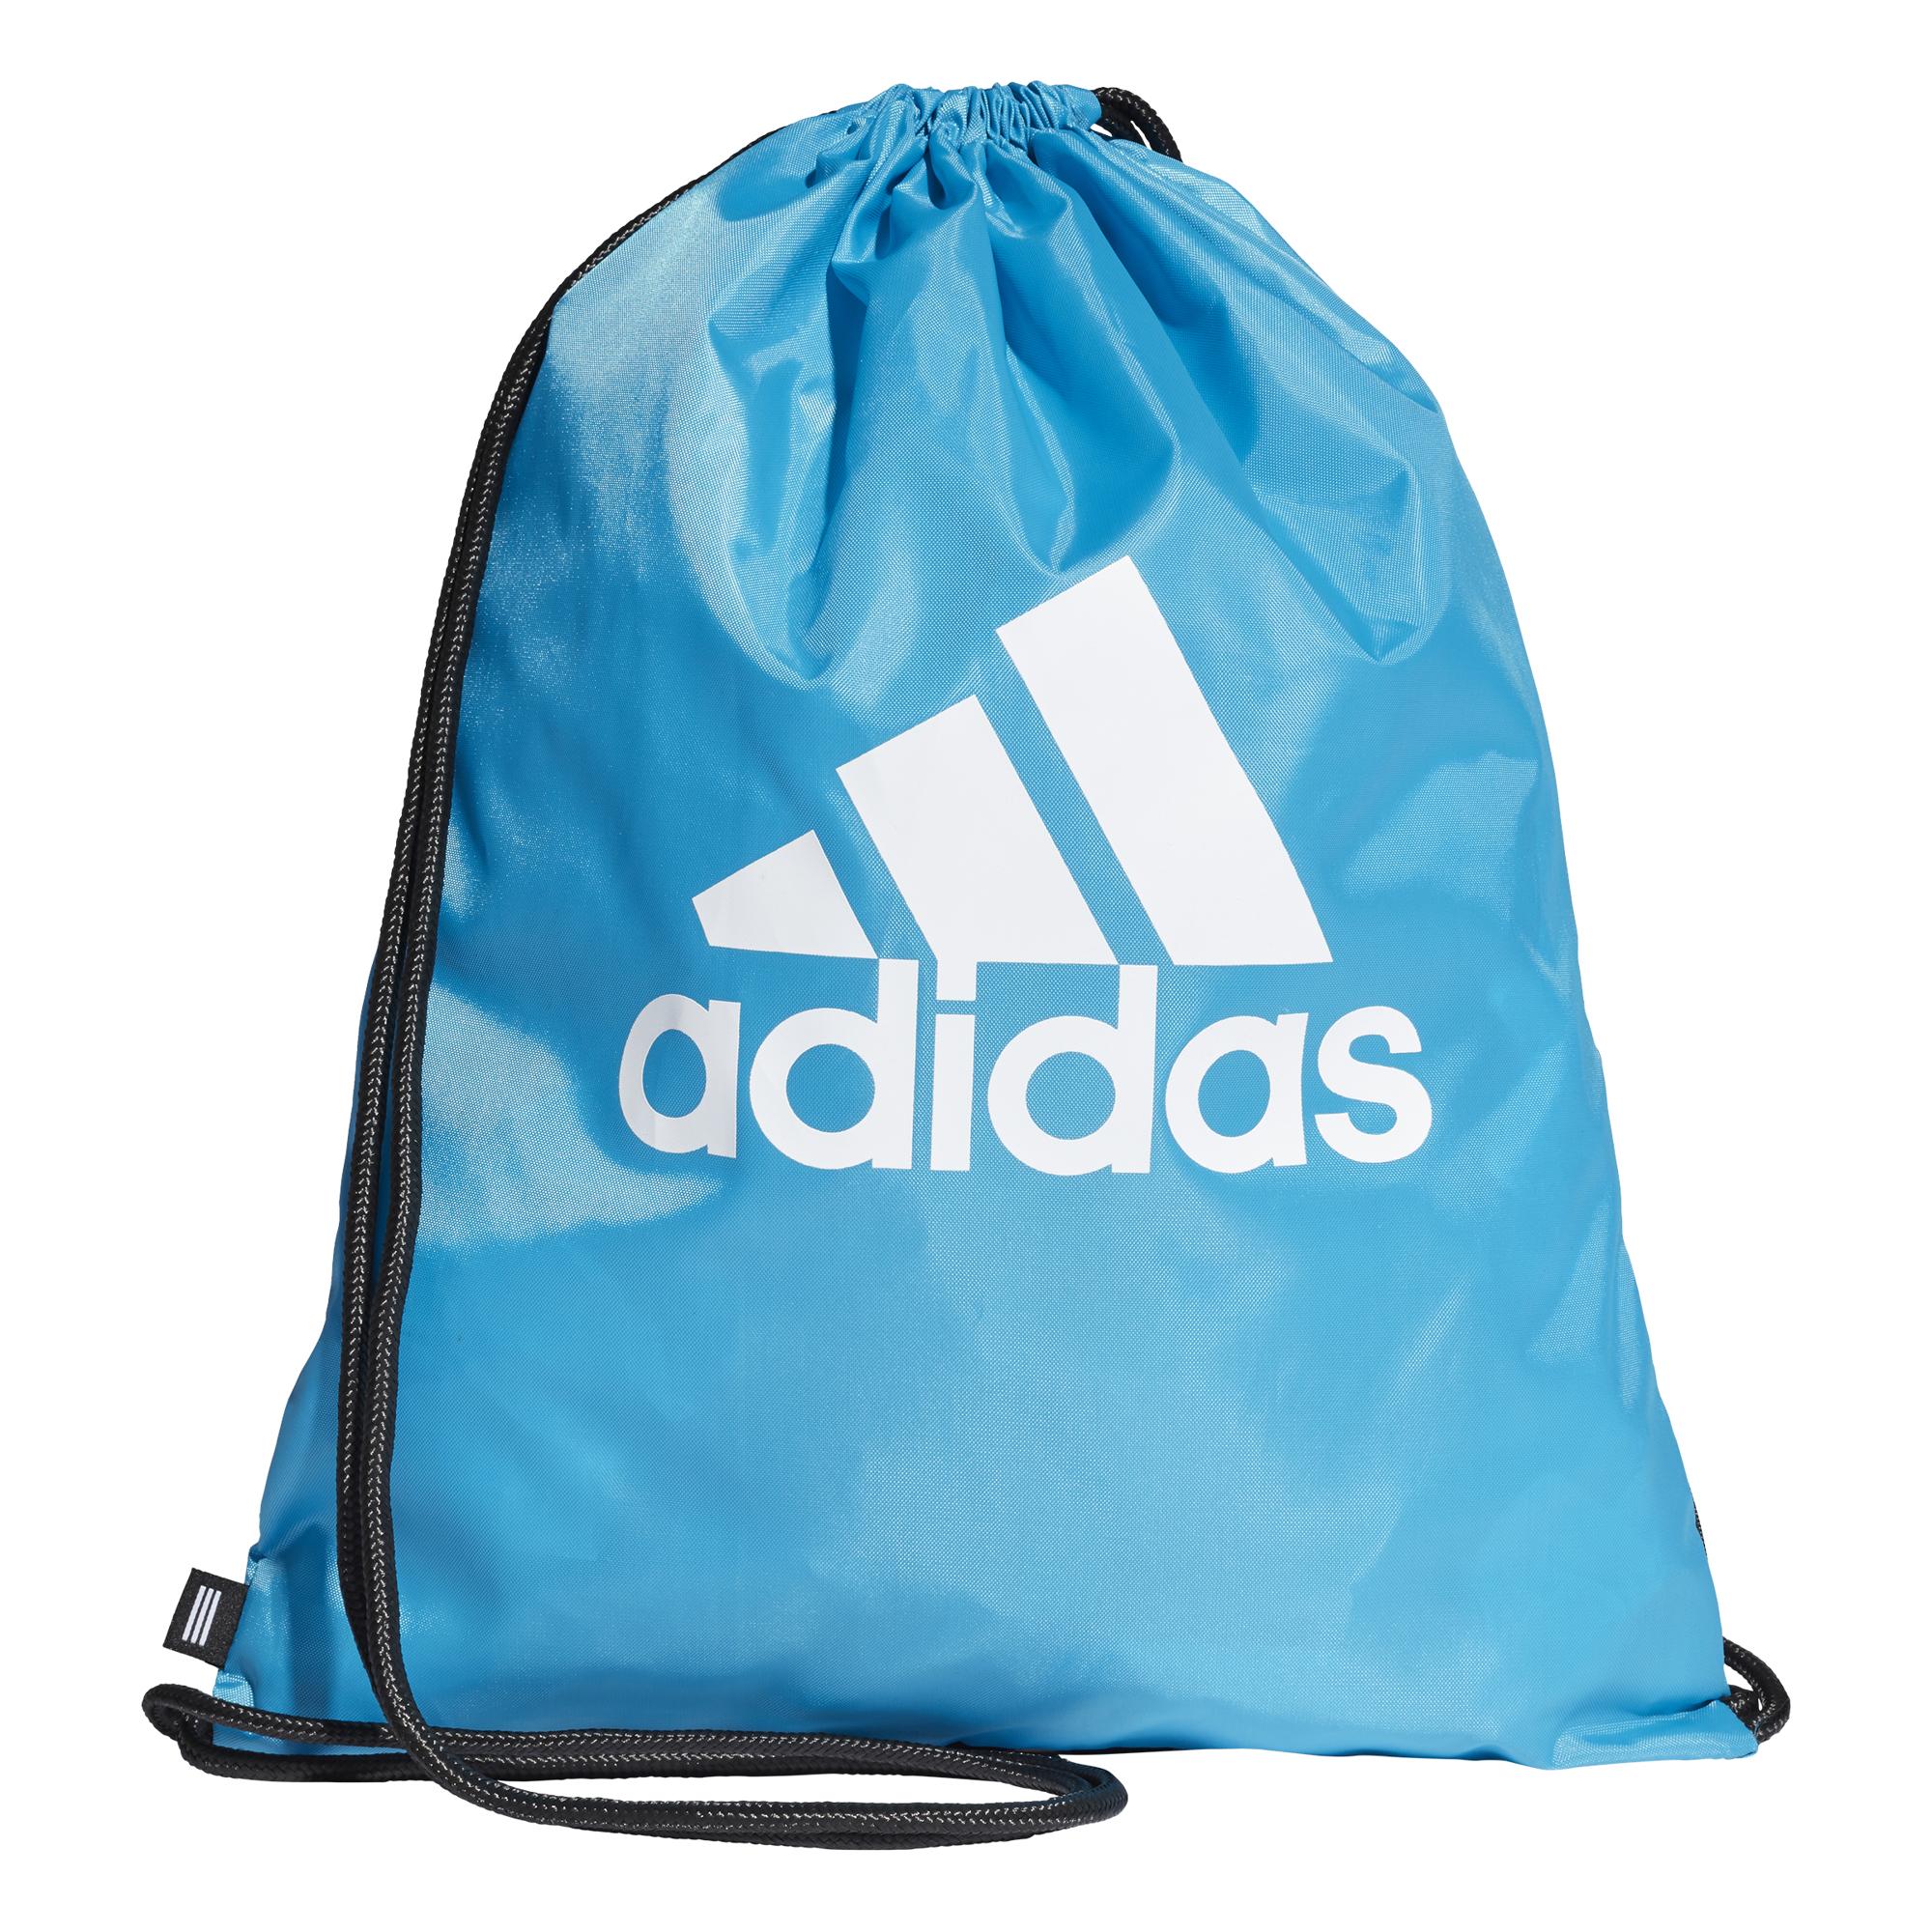 5a2be1c95d230 worek adidas Performance Logo DT2597 || timsport.pl - dodatkowe ...